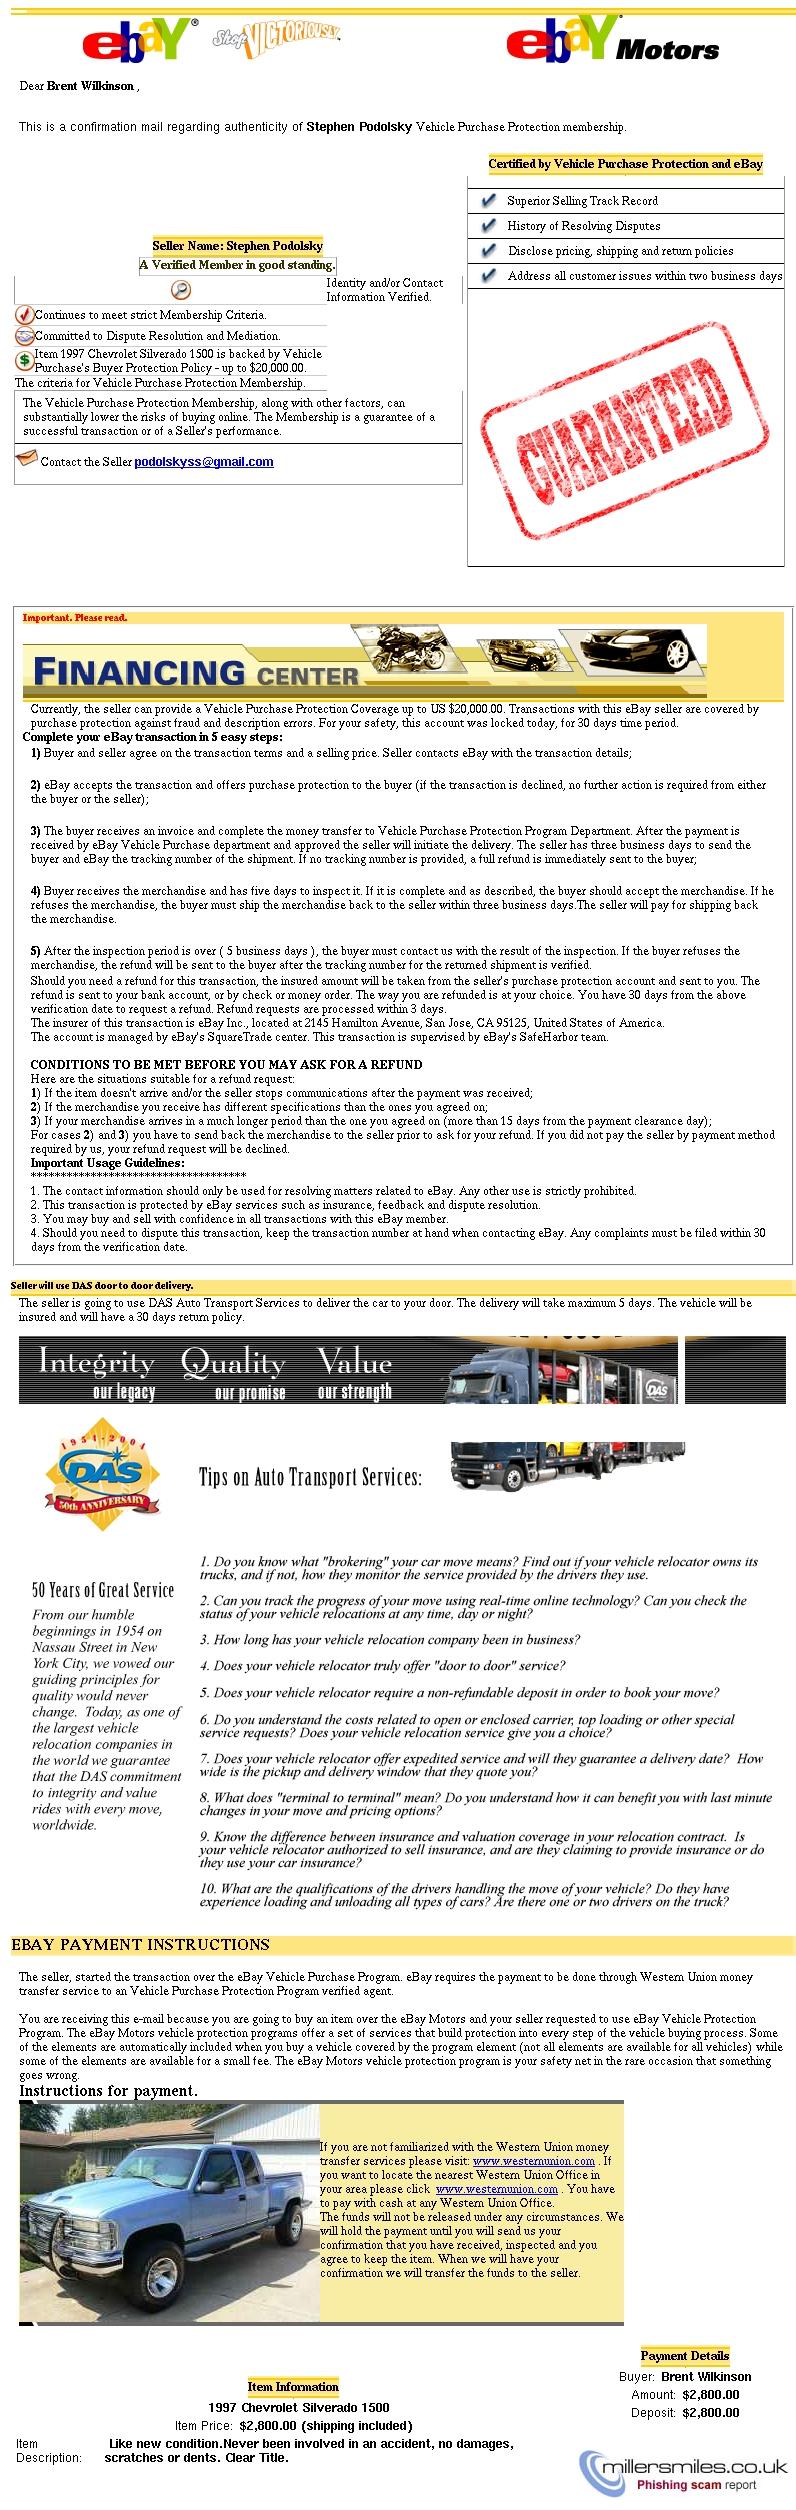 Ebay Vehicle Protection Purchase Program Rs9452t01523usa Ebay Phishing Scams Millersmiles Co Uk